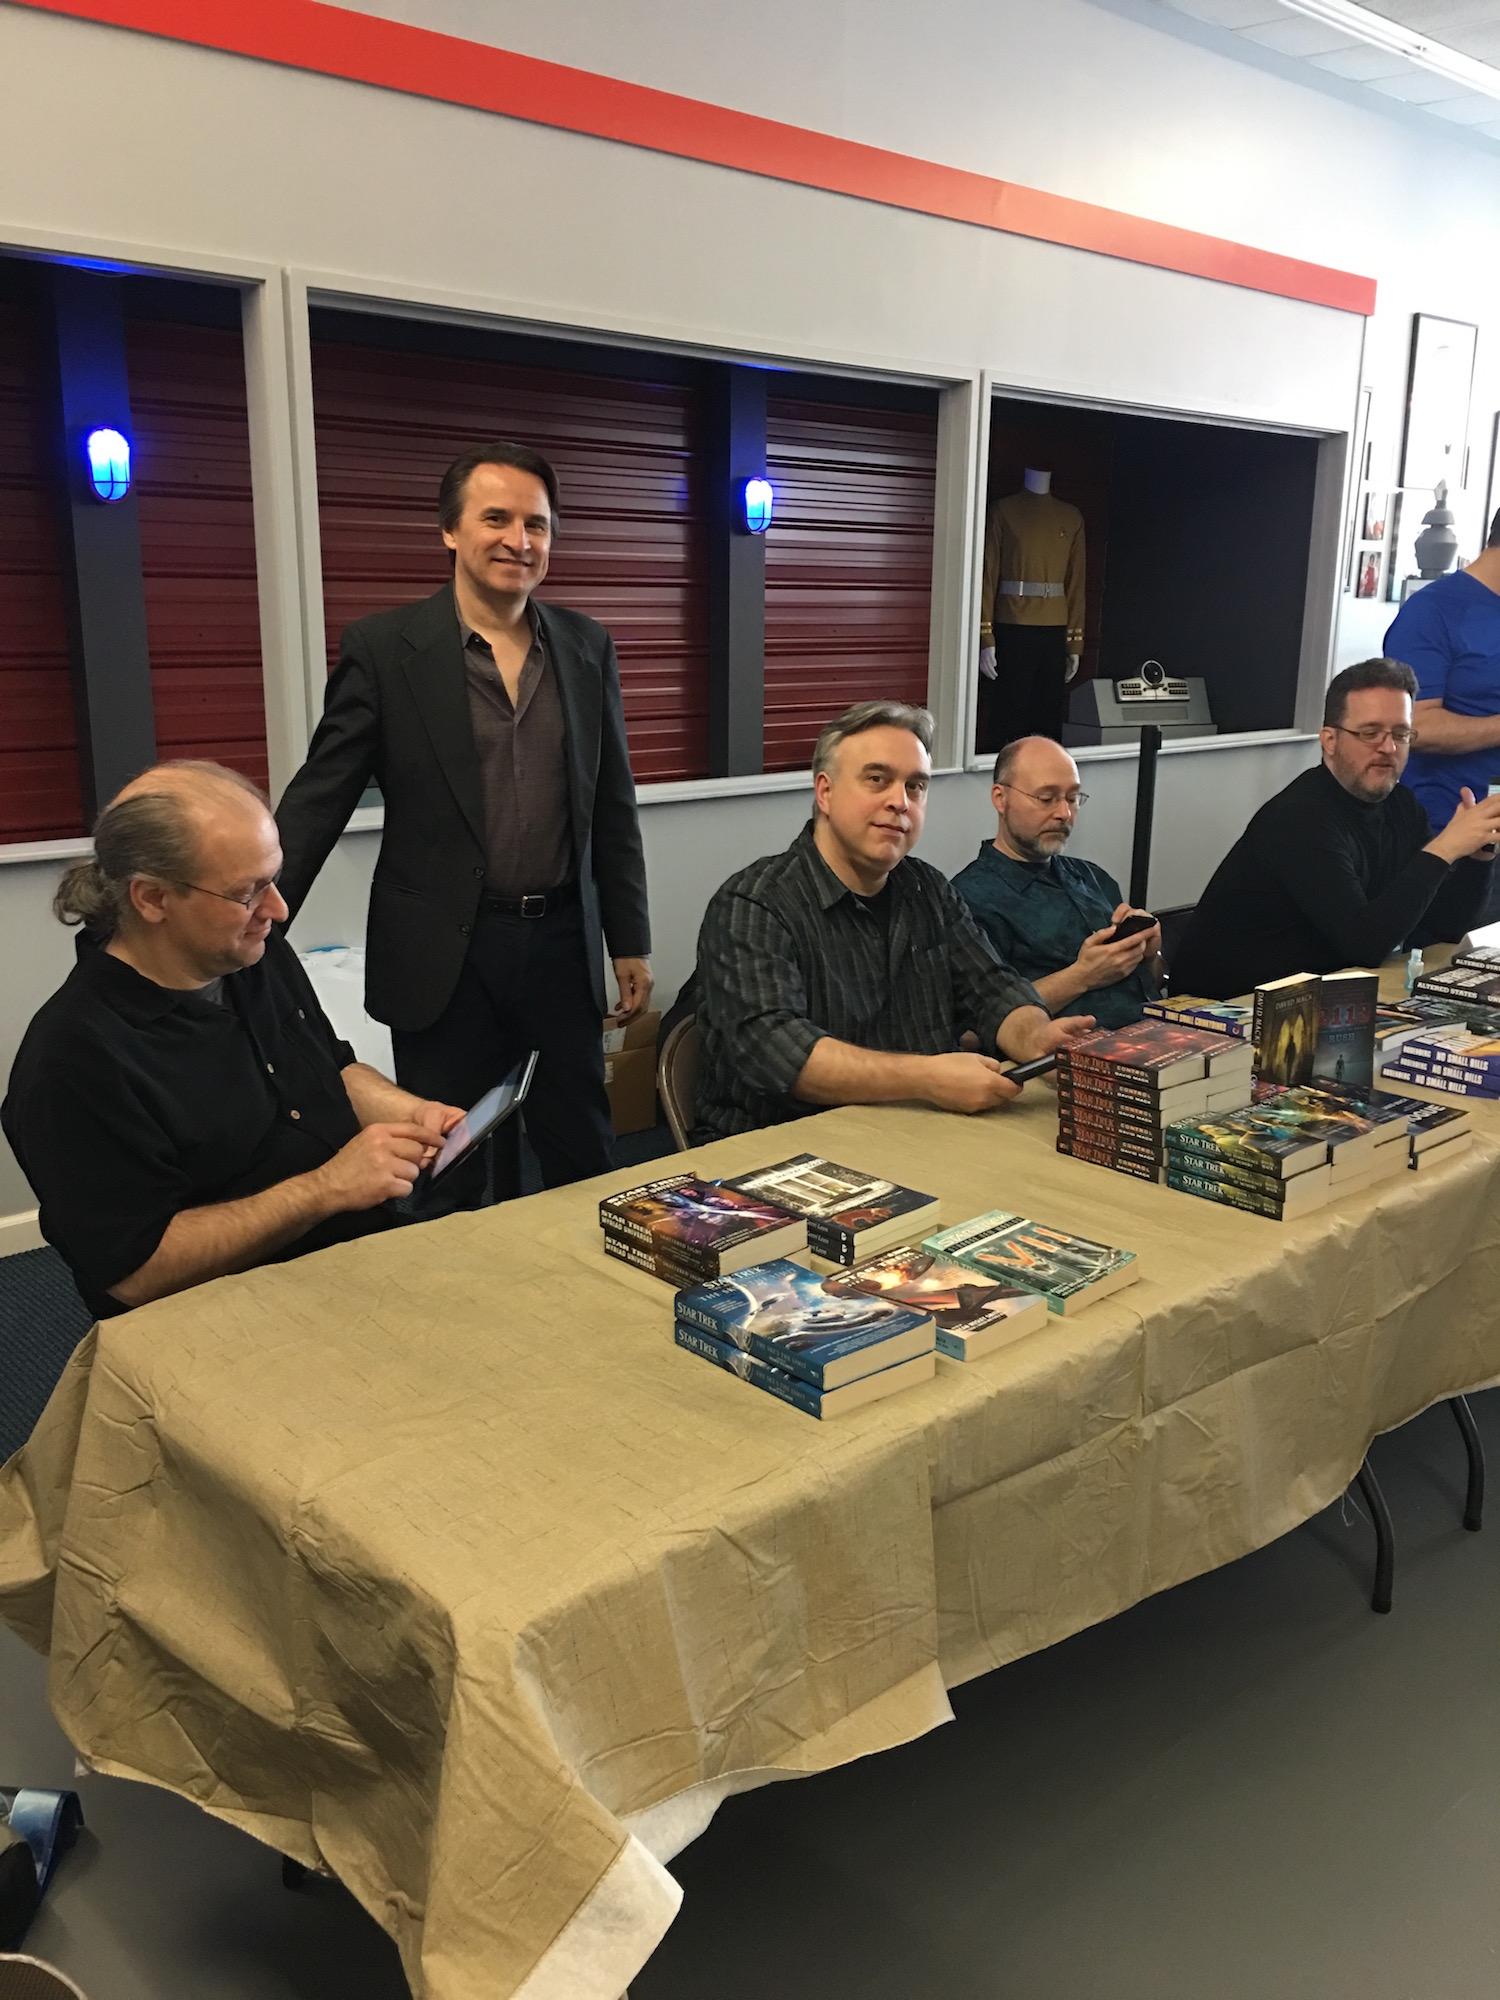 From Left to Right: Scott Pearson, DRG III, David Mack, Aaron Rosenberg, and Glenn Hauman ©2017 Karen Ragan-George